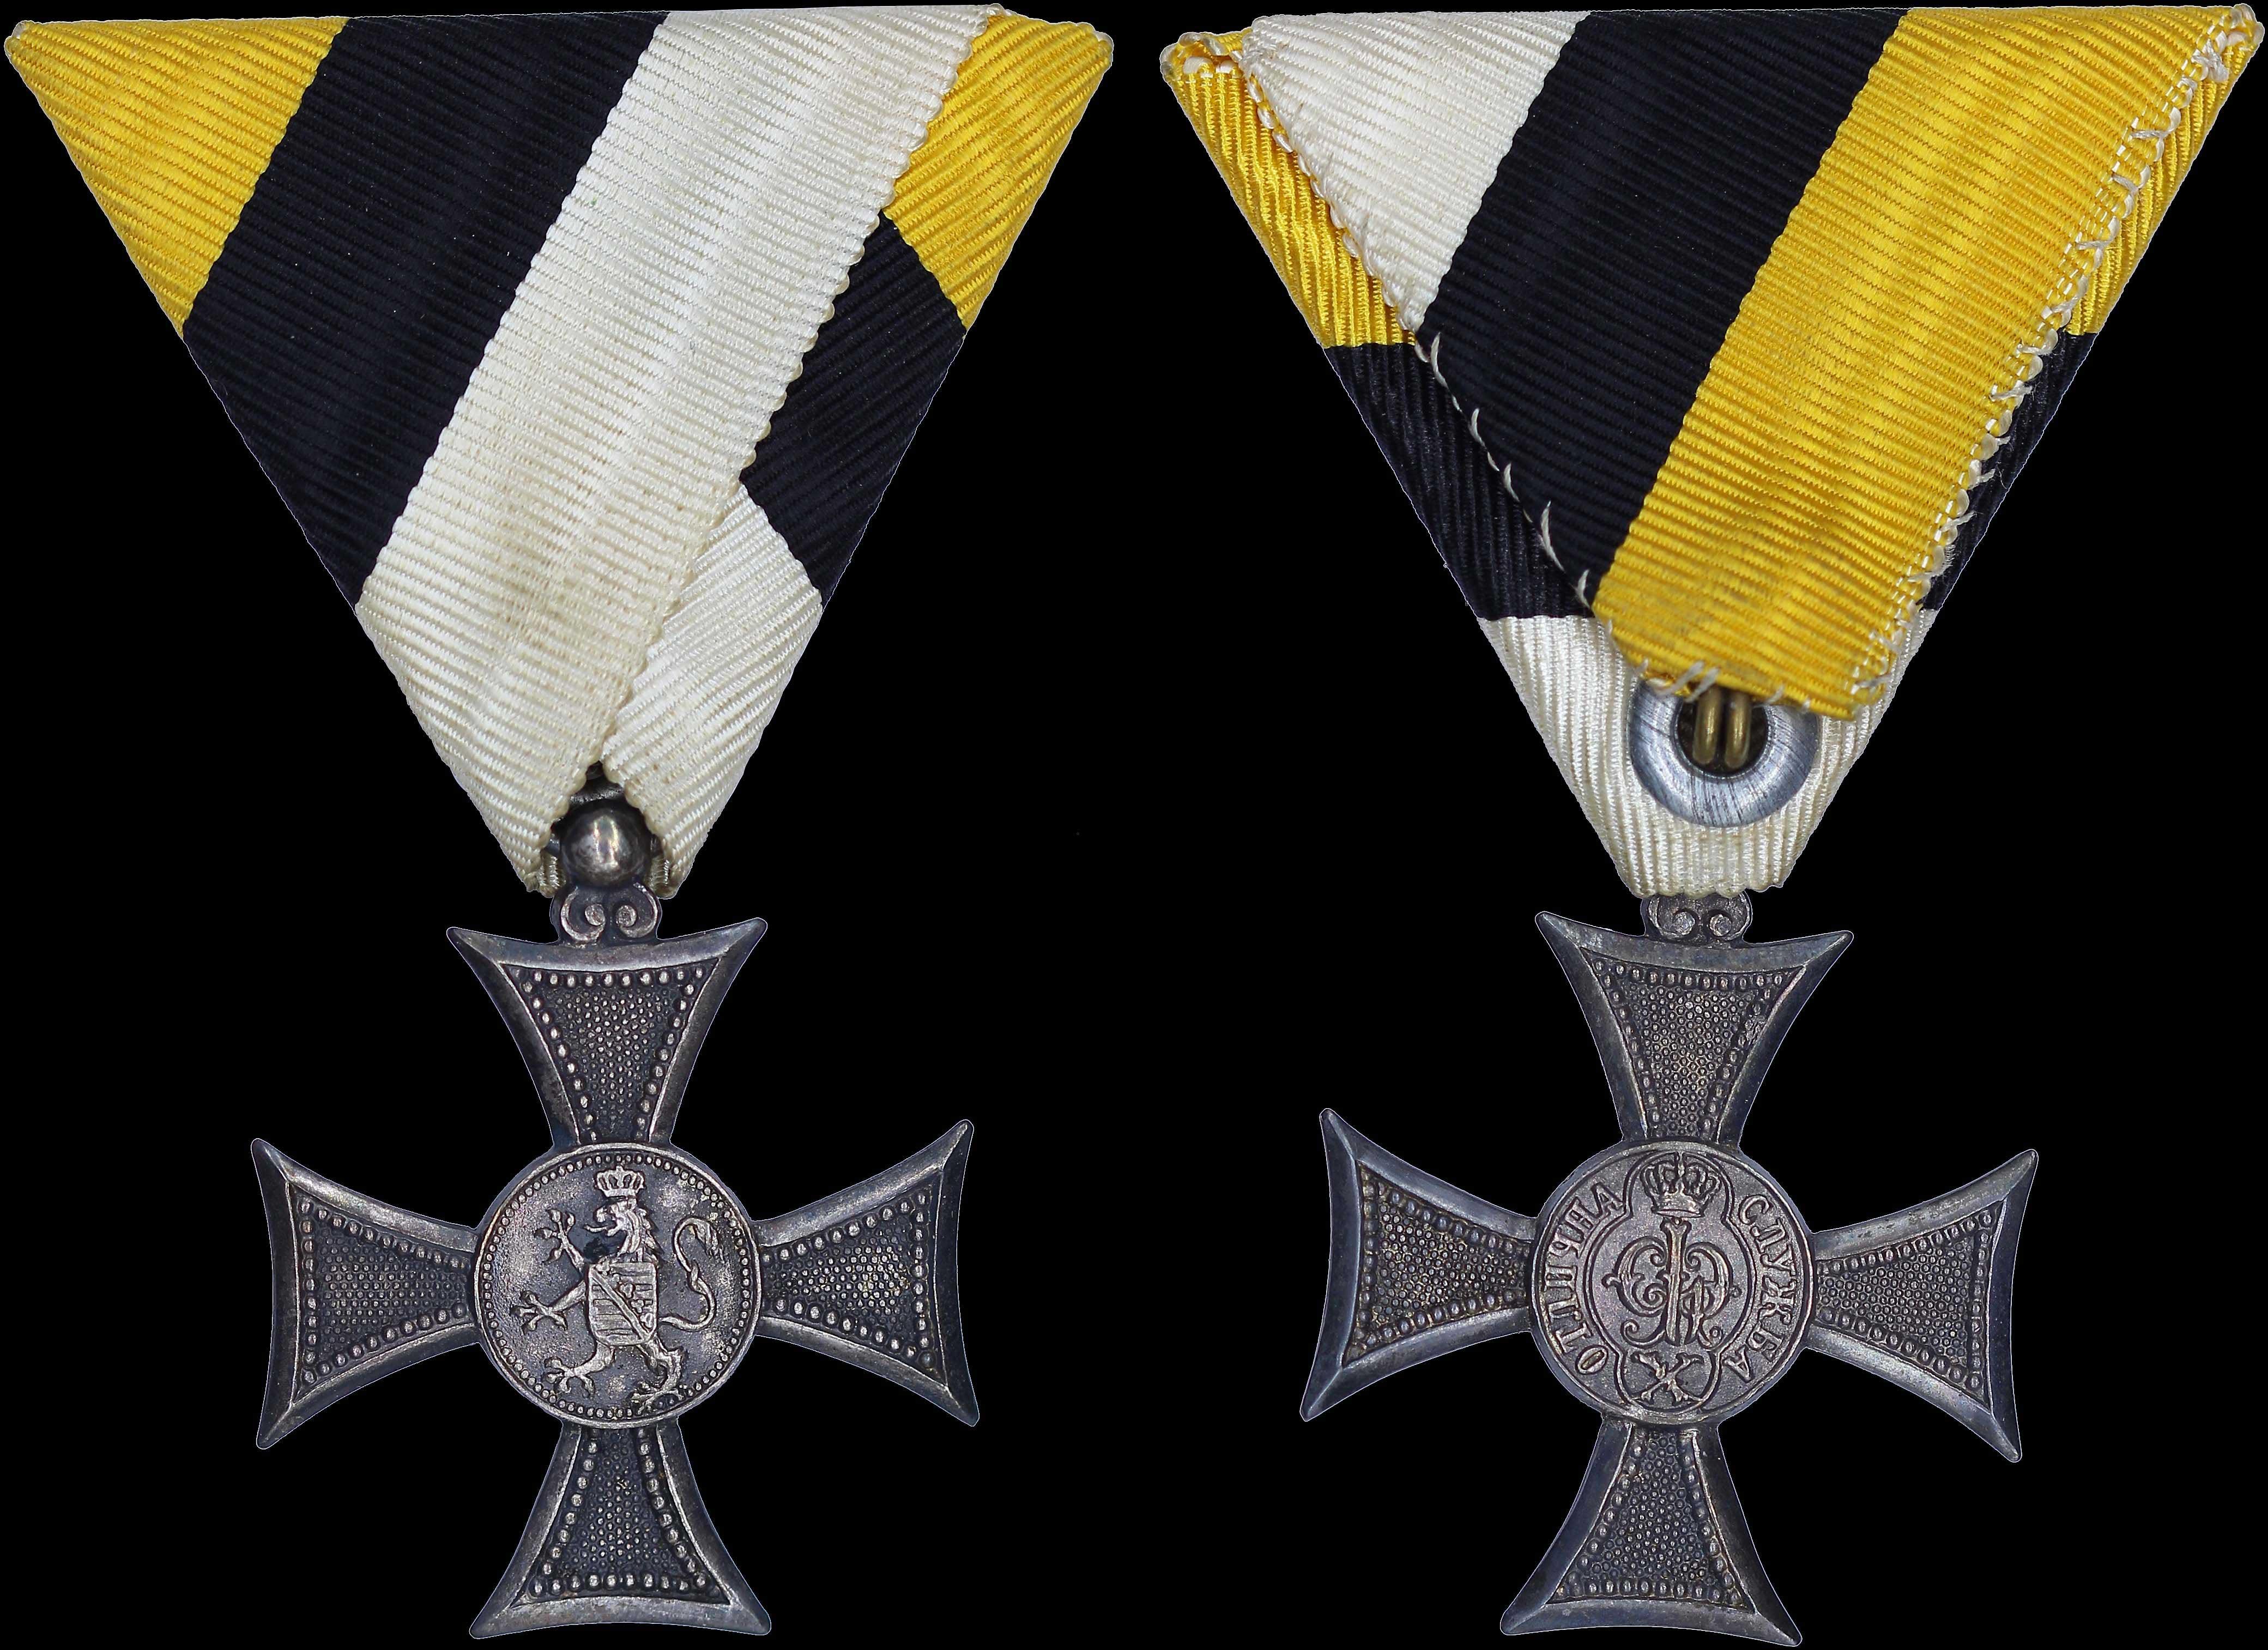 Lot 7358 - -  MEDALS & DECORATIONS FOREIGN MEDALS & DECORATIONS -  A. Karamitsos Public & Live Internet Auction 682 (Part B) Coins, Medals & Banknotes